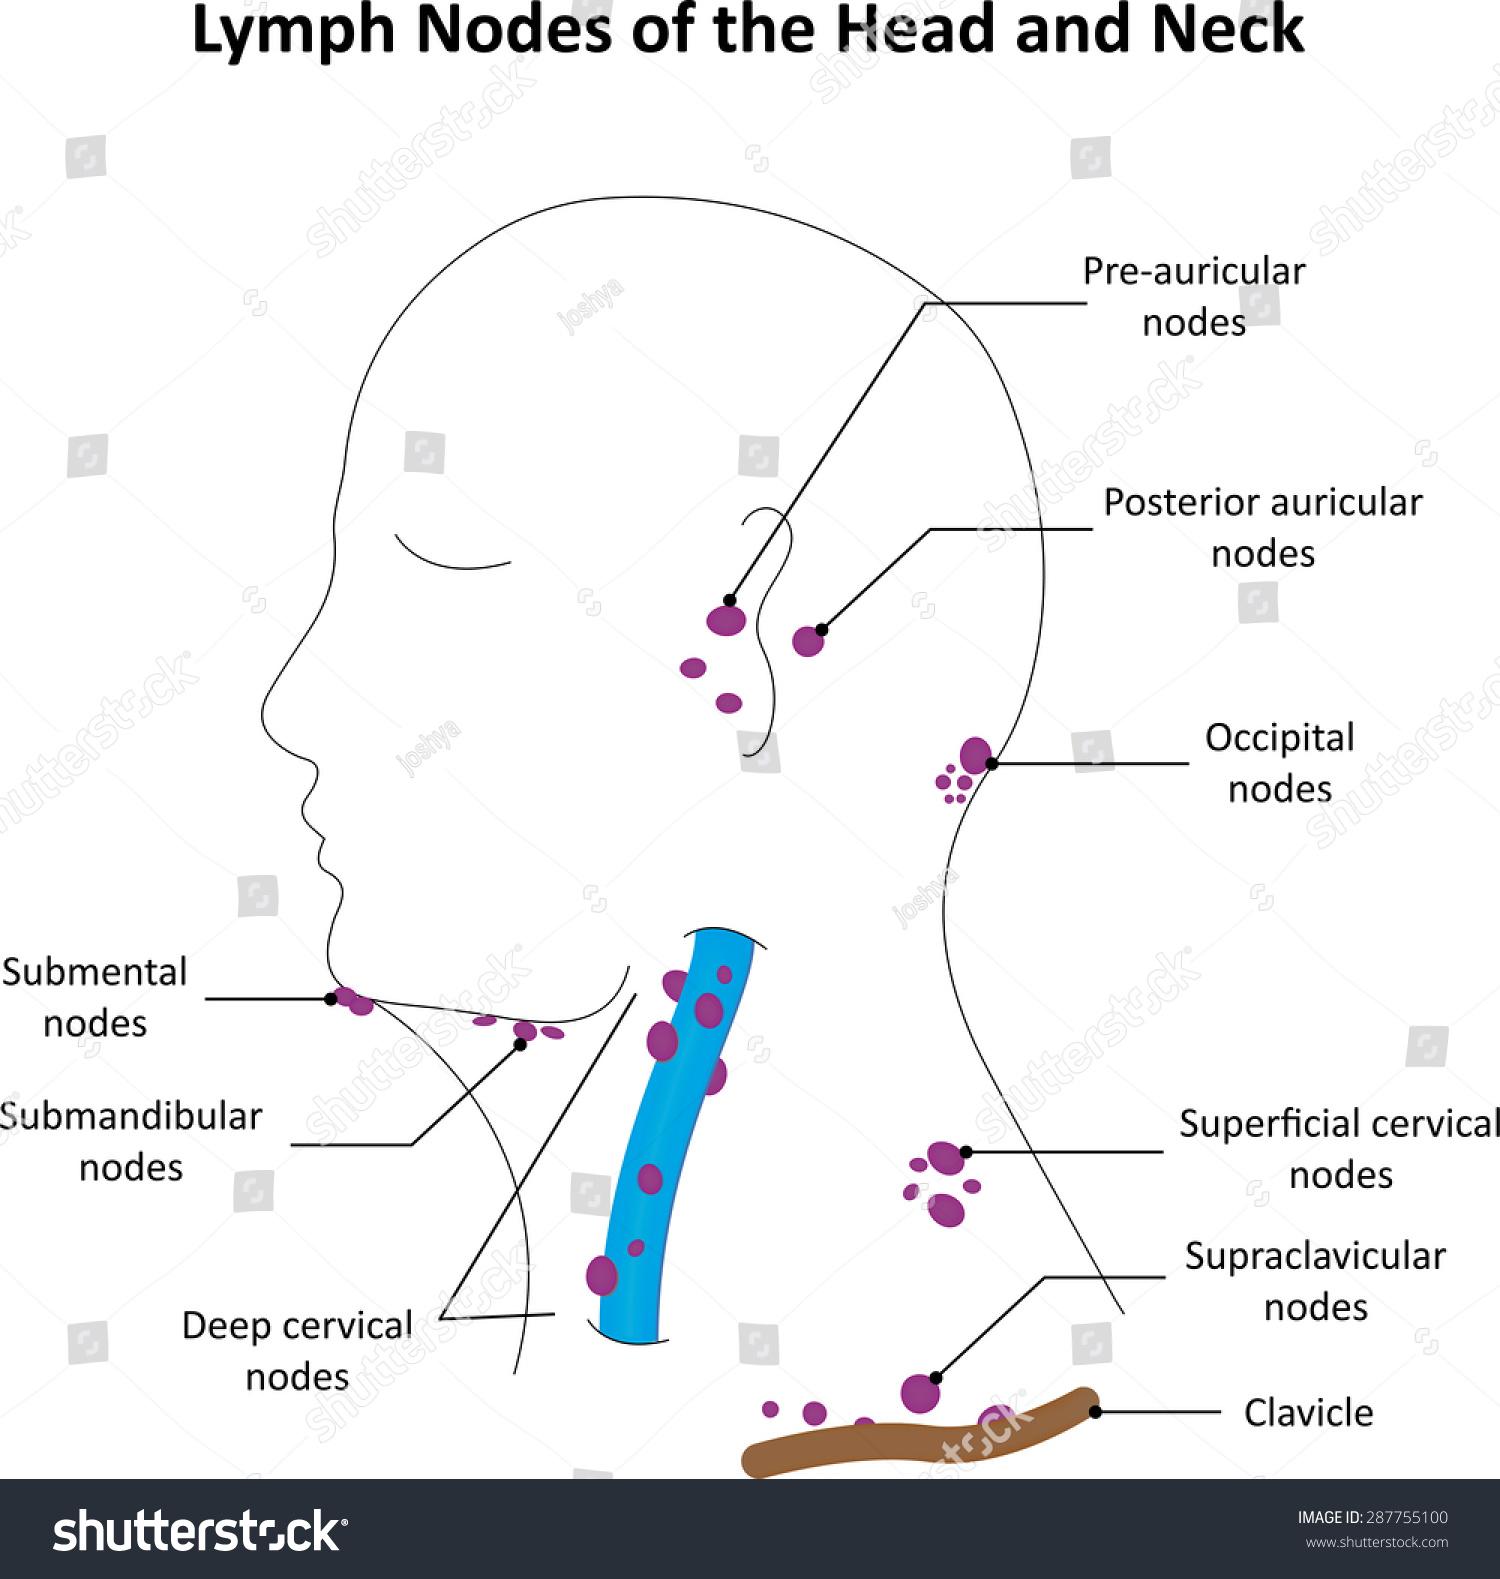 Lymph       Nodes       Head    Neck Labelled    Diagram    Stock Illustration